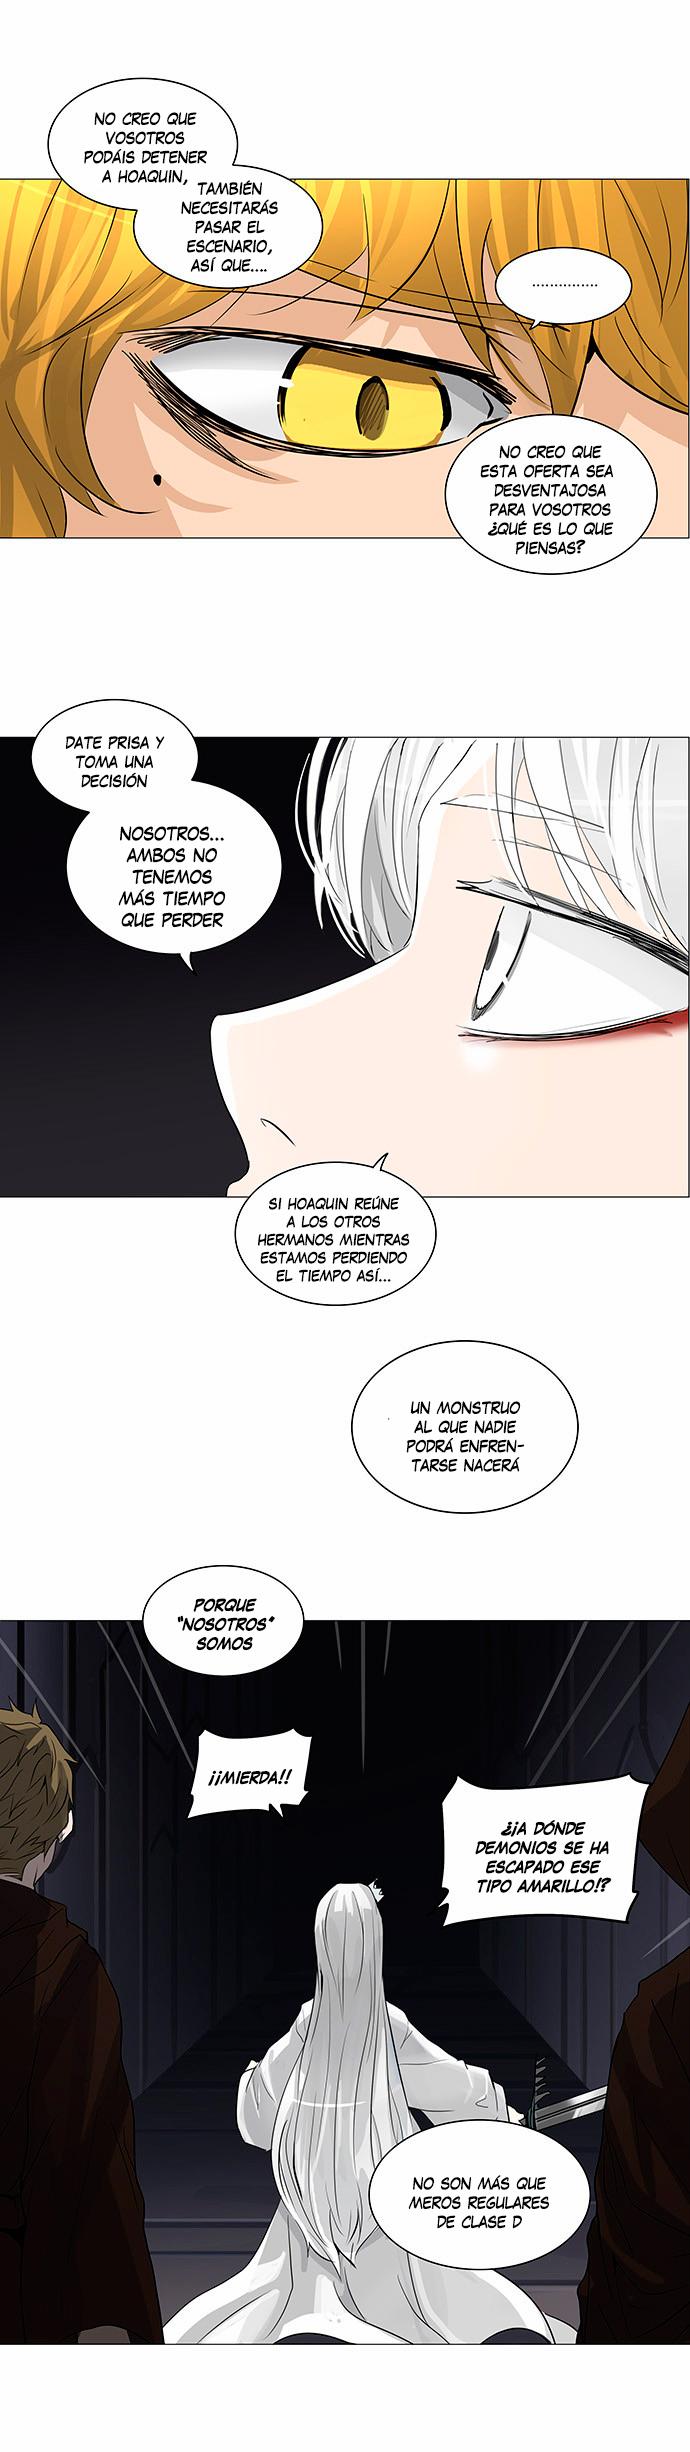 http://c5.ninemanga.com/es_manga/21/149/417885/46673d49b30de9f06adfcdd257a7556b.jpg Page 33